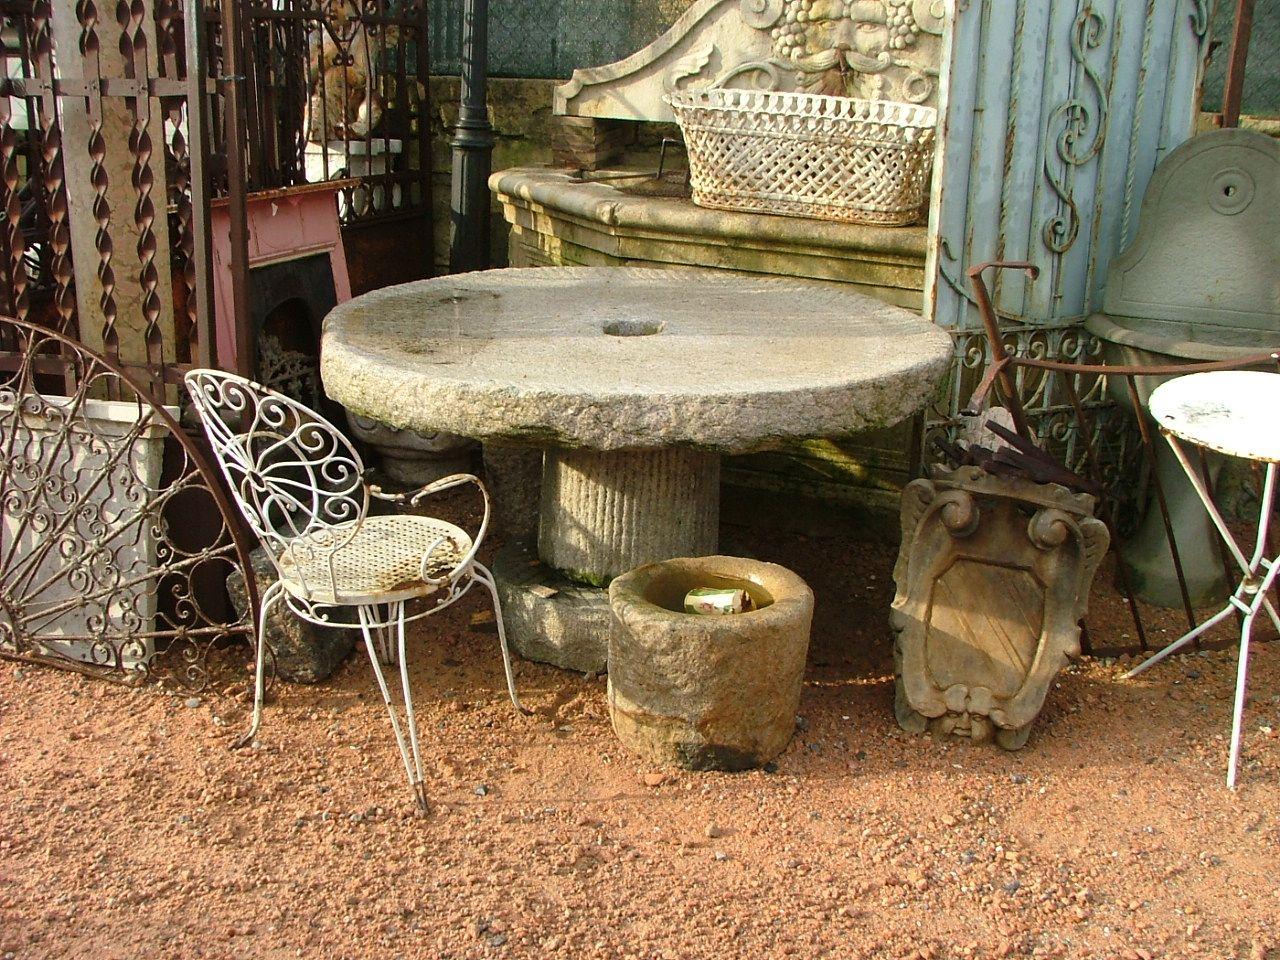 Tavoli Da Giardino Antichi.Macina Da Mulino Tavolo Da Giardino Antiquariato Su Anticoantico